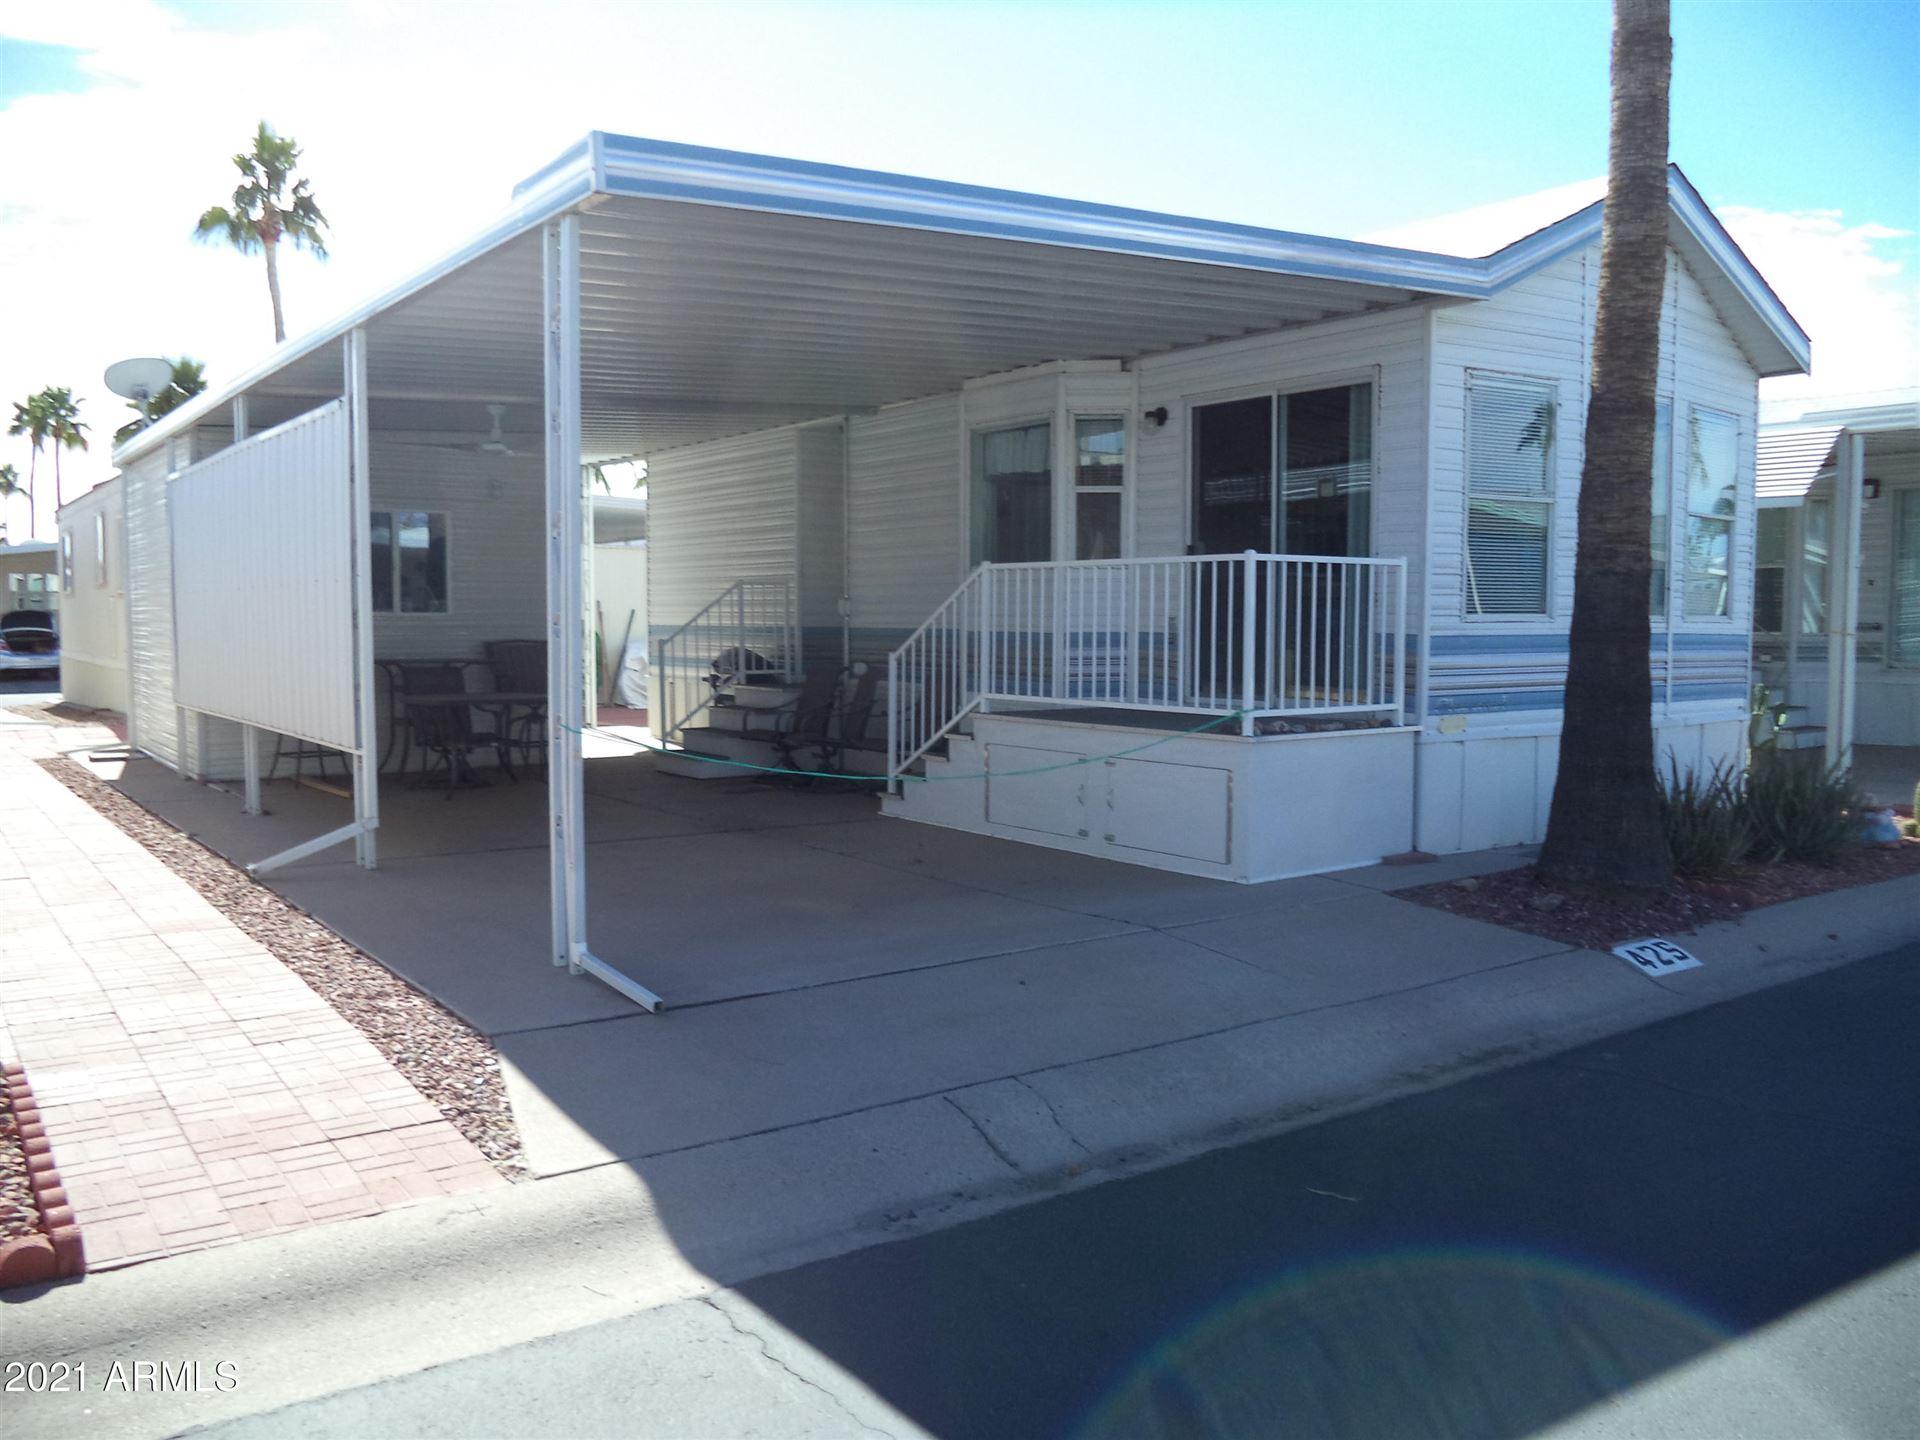 Photo of 425 S IRONSTONE Drive, Apache Junction, AZ 85119 (MLS # 6294500)